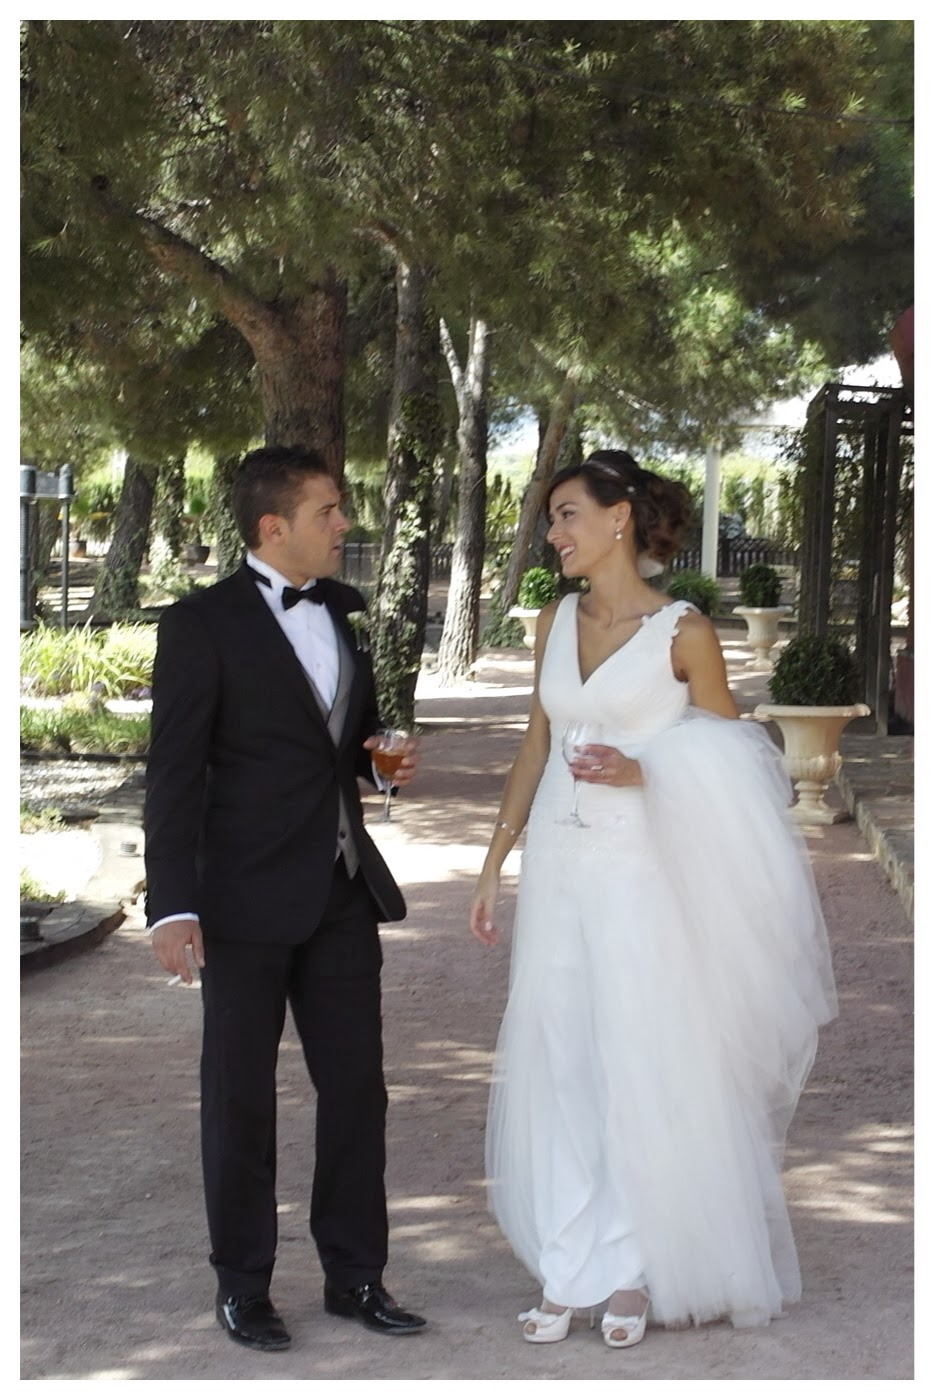 Recogido de novia e invitadas estilismo con romy - Recogido de novia ...